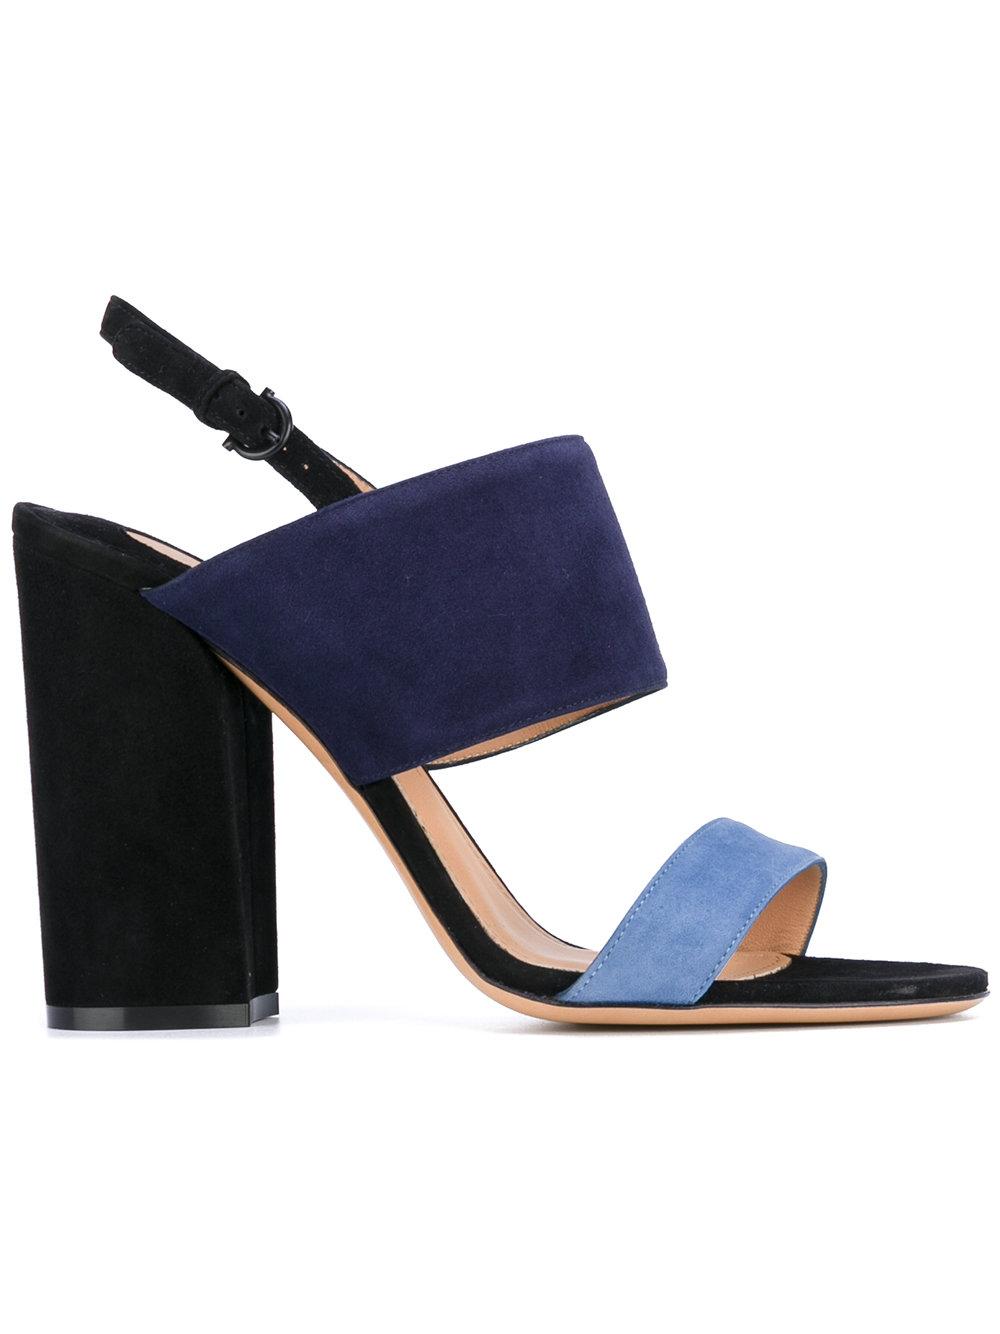 428d8c818 Salvatore Ferragamo Open Toe Sandals - Farfetch